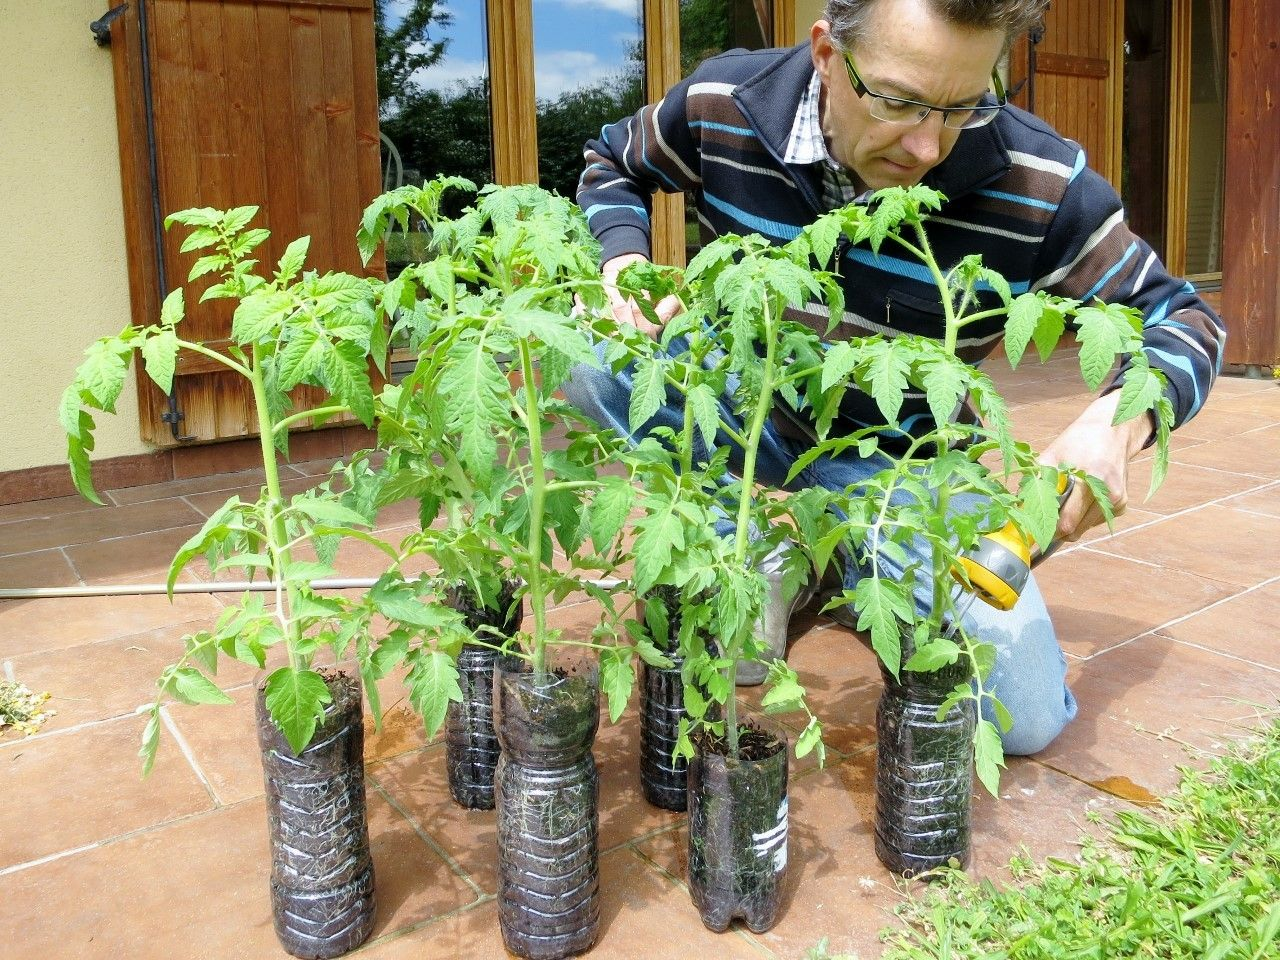 Ma culture de tomates en pots Potager tomates, Design de